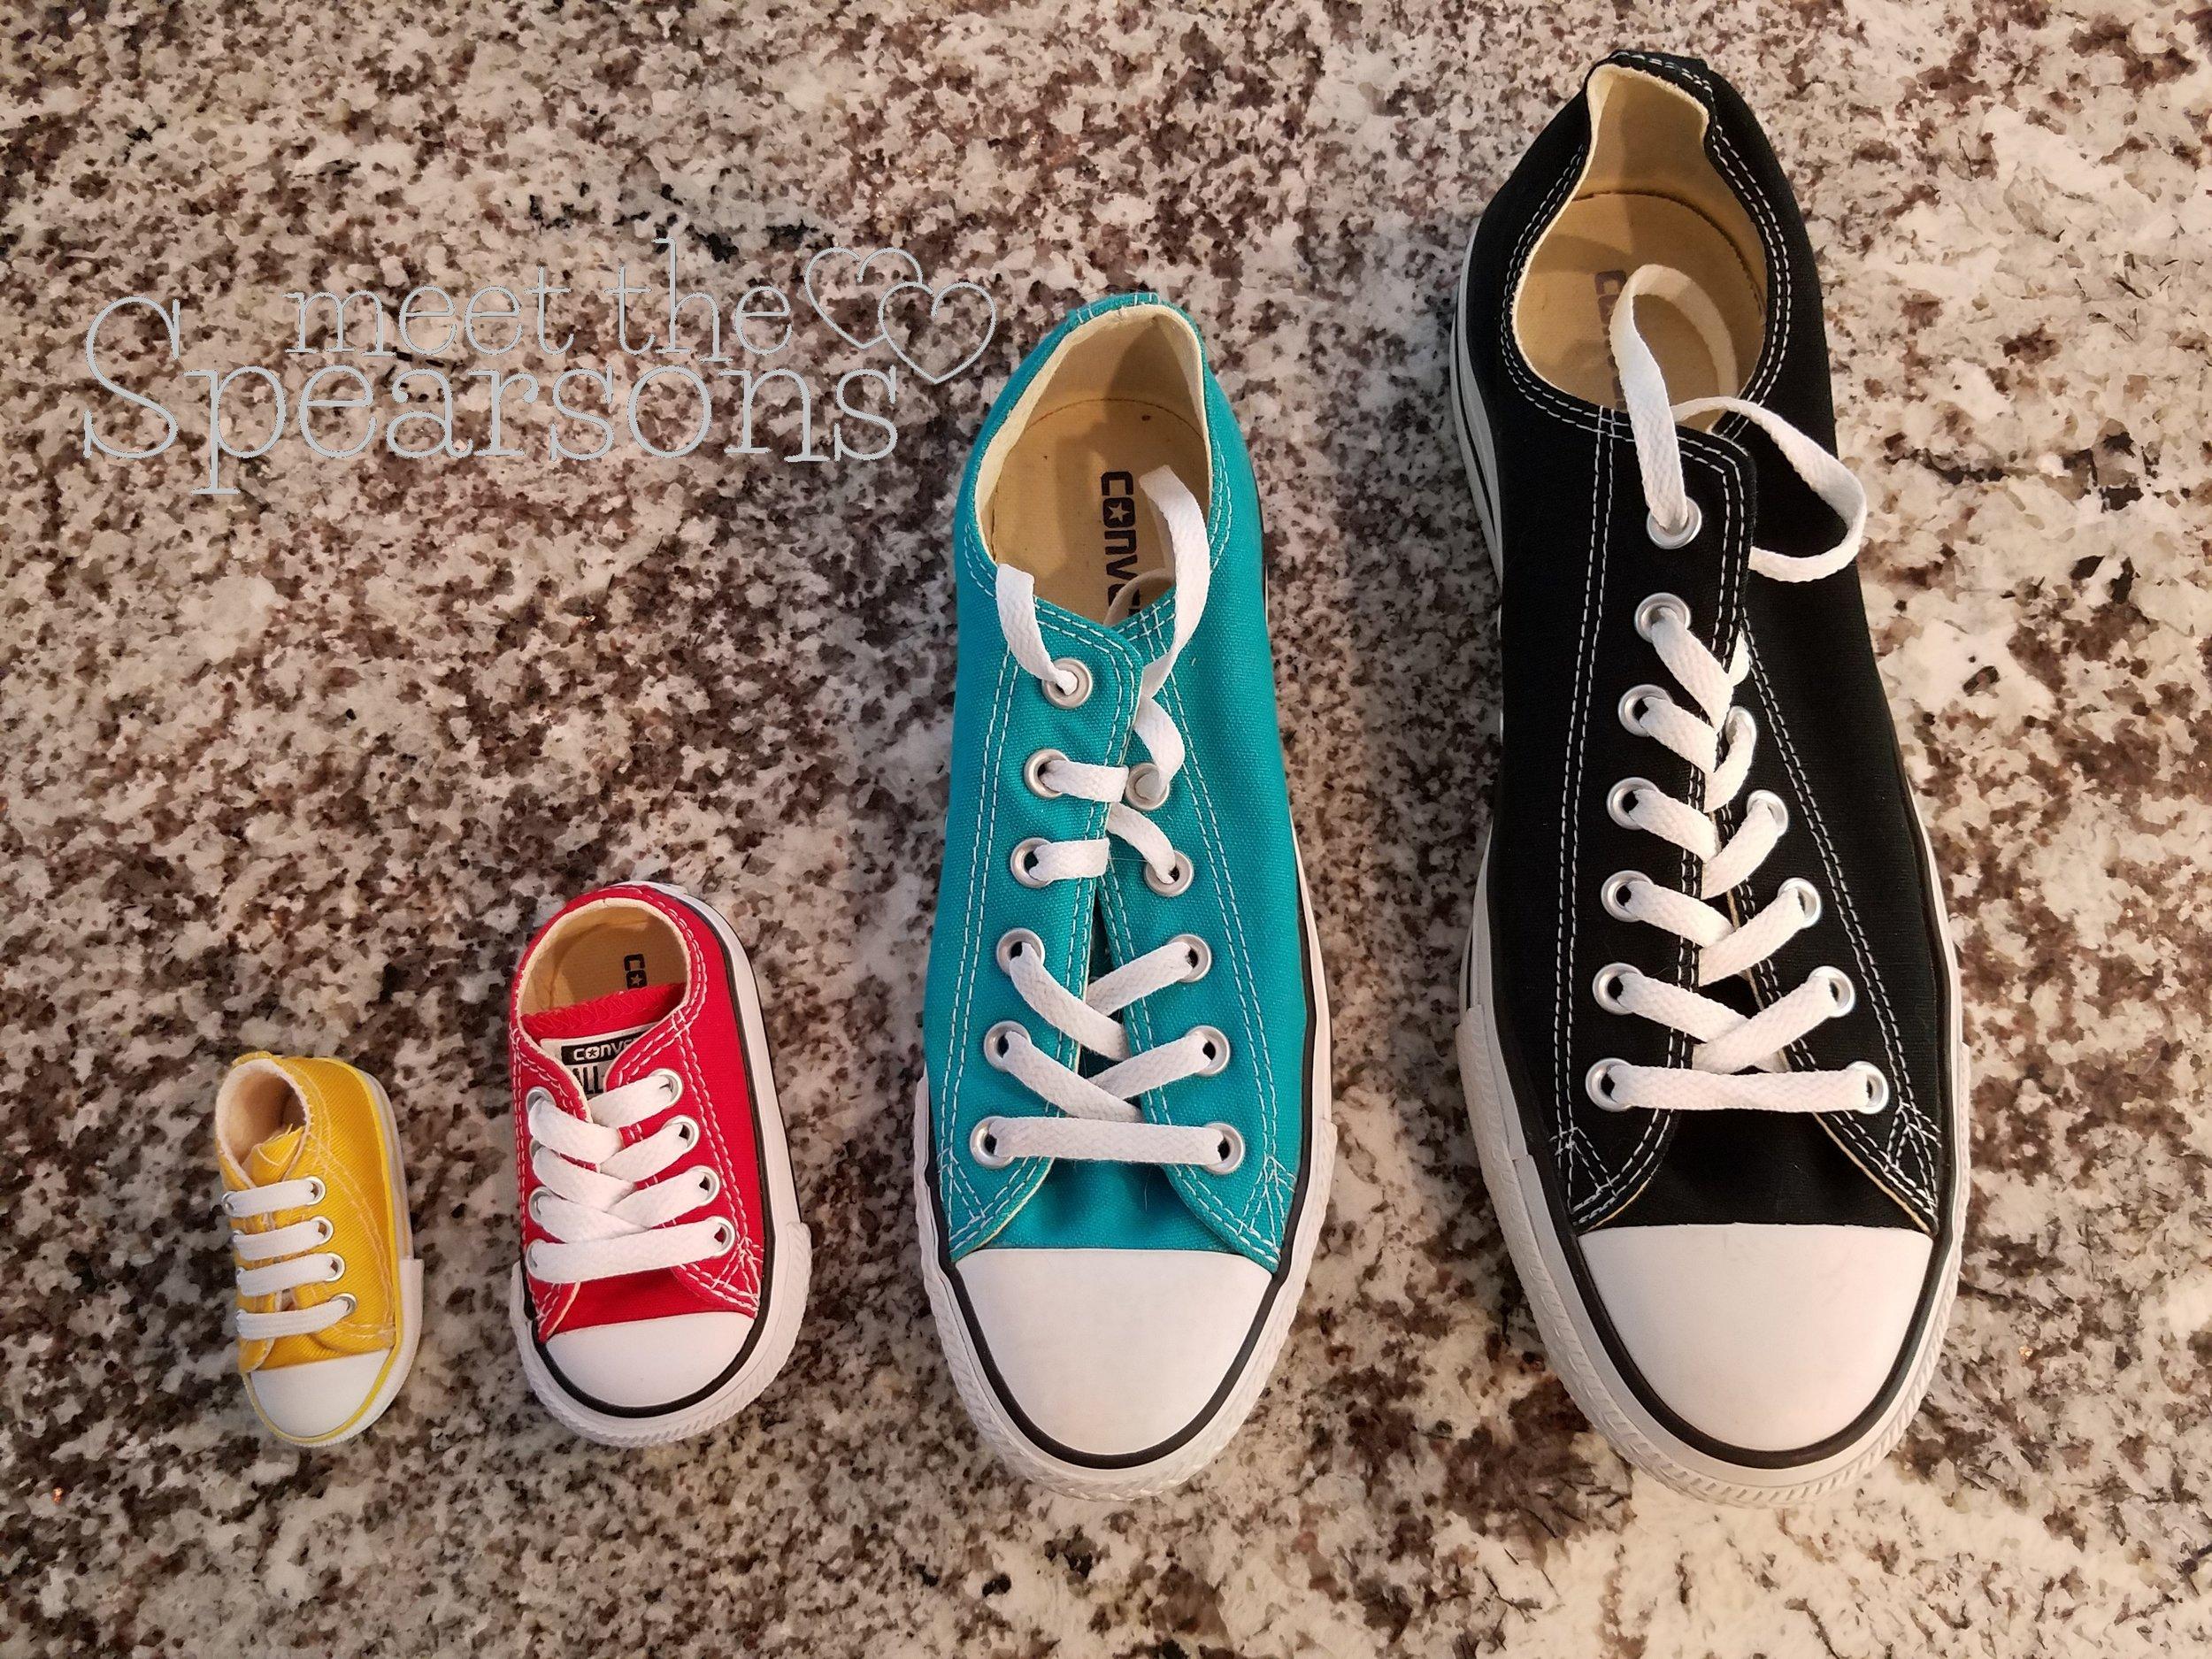 Converse Sneakers Pregnancy Announcement